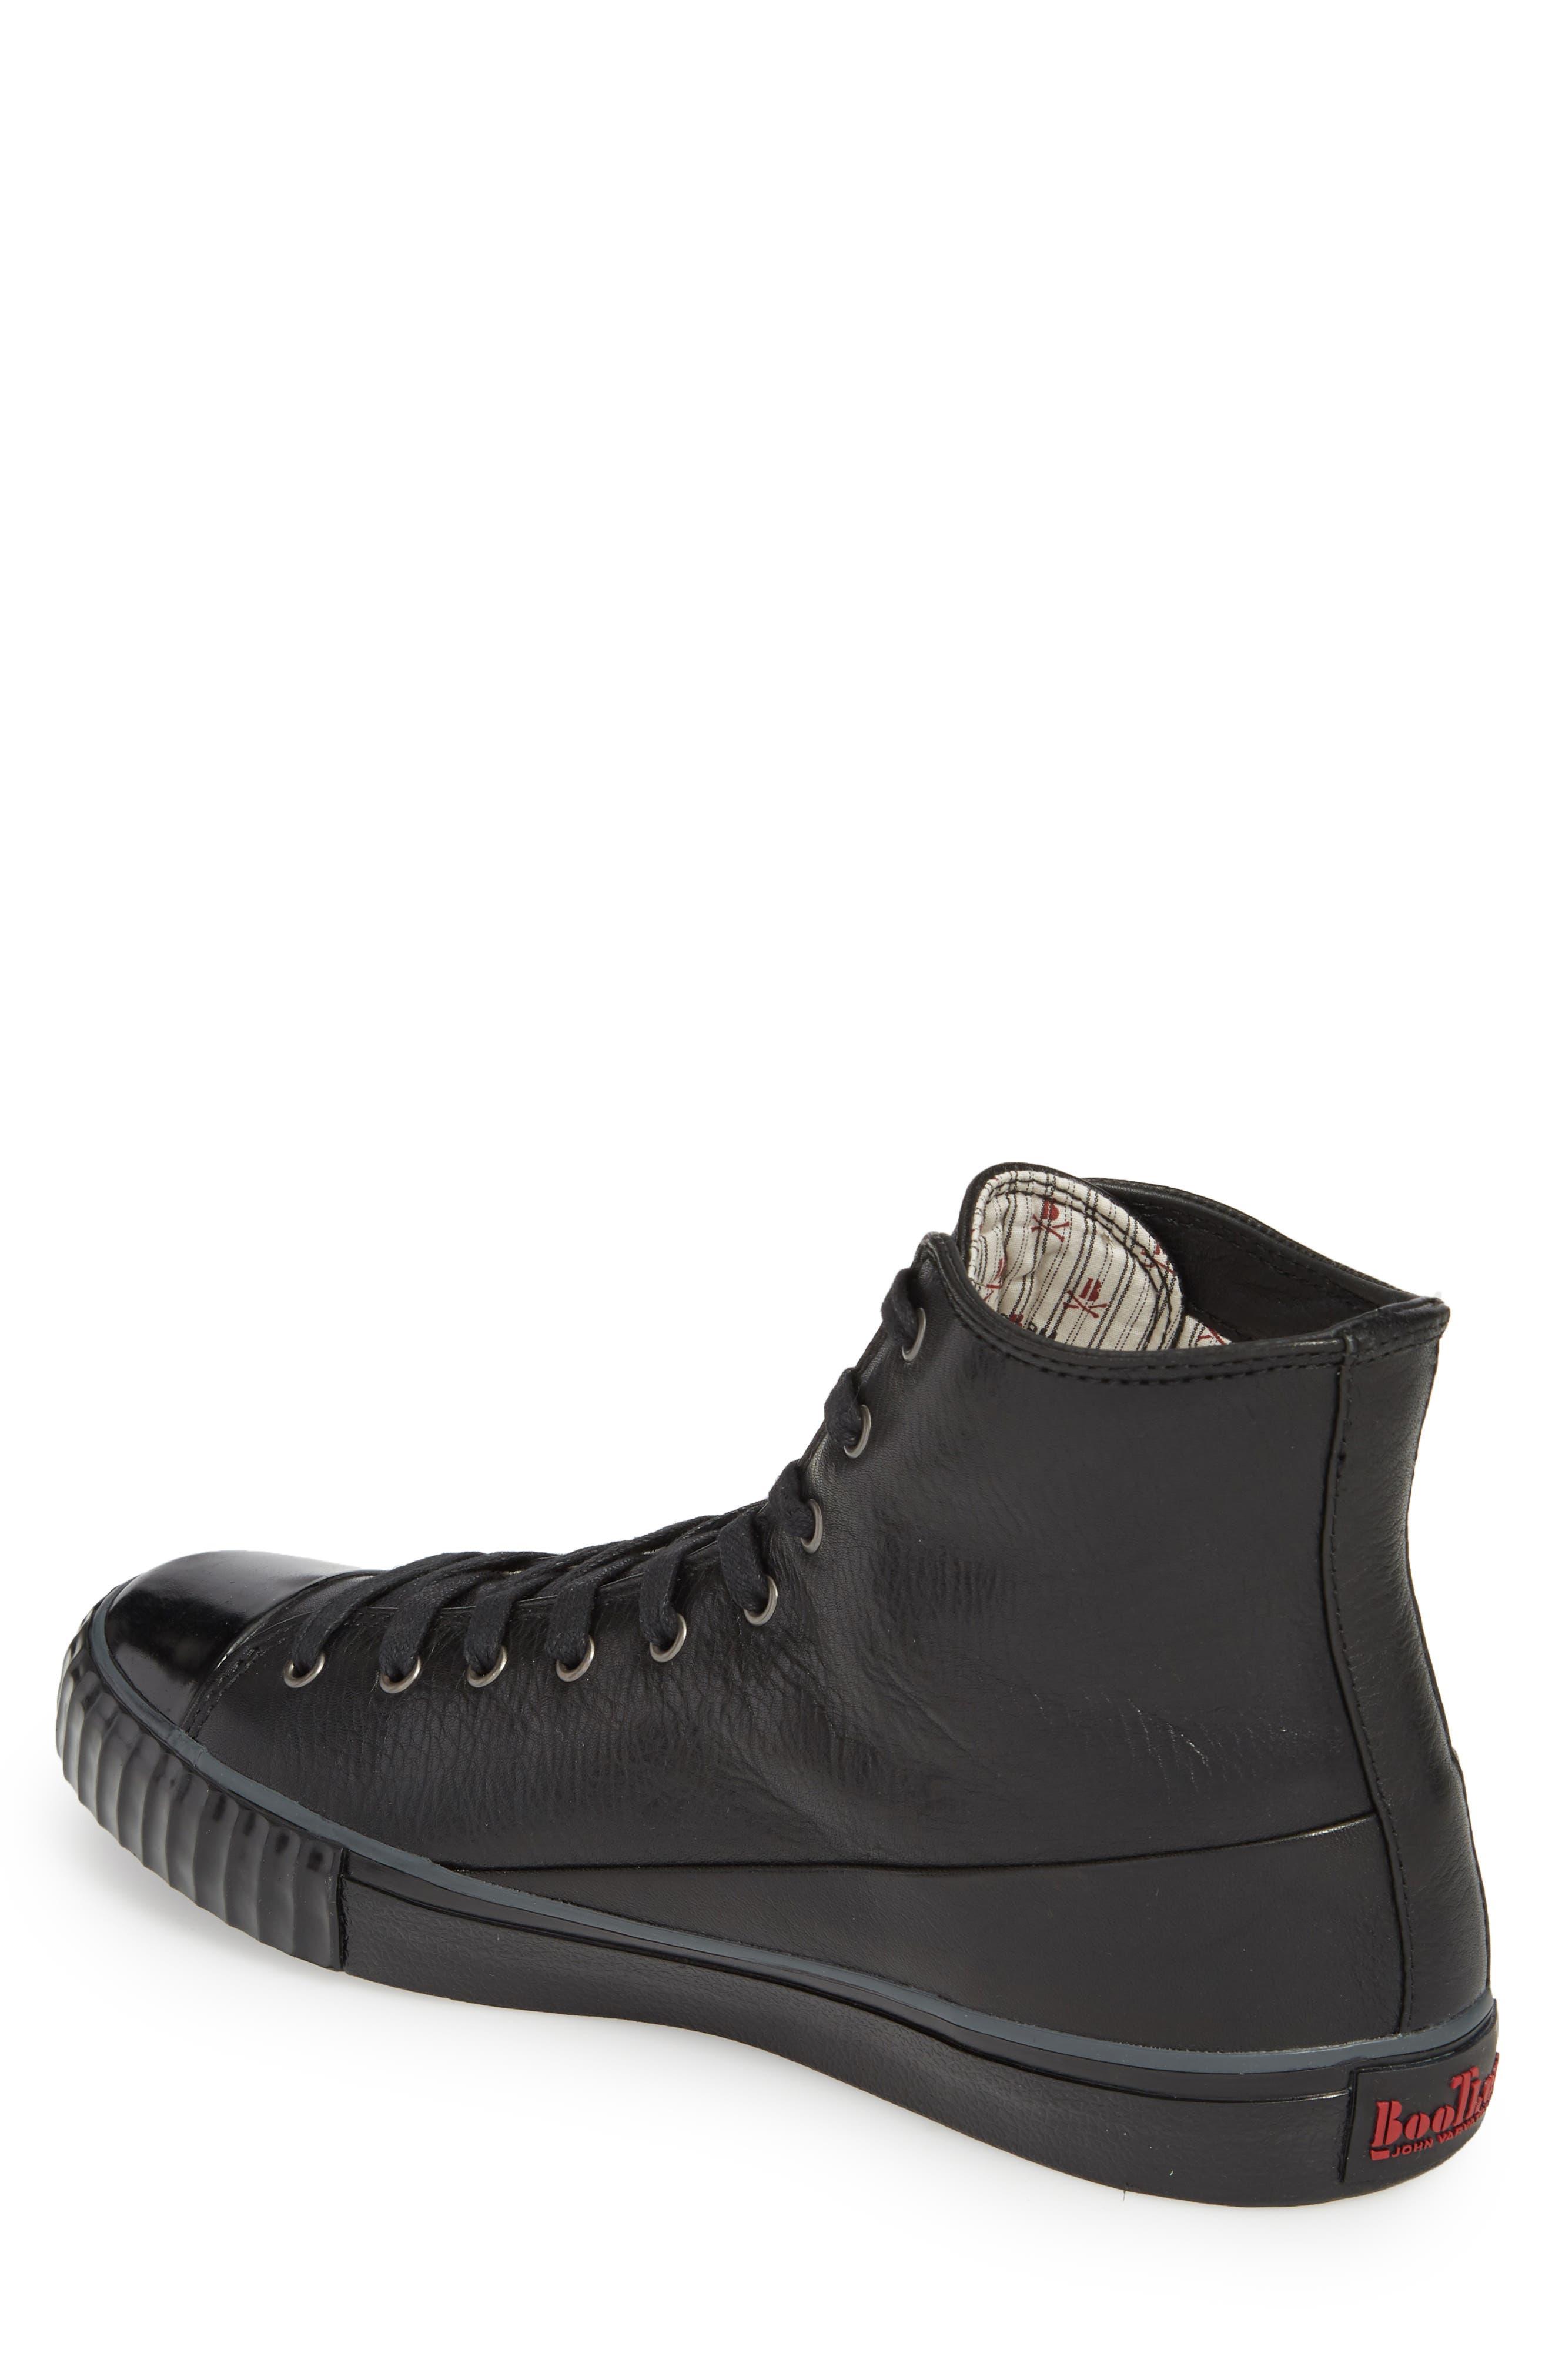 Bootleg High Top Sneaker,                             Alternate thumbnail 2, color,                             BLACK LEATHER